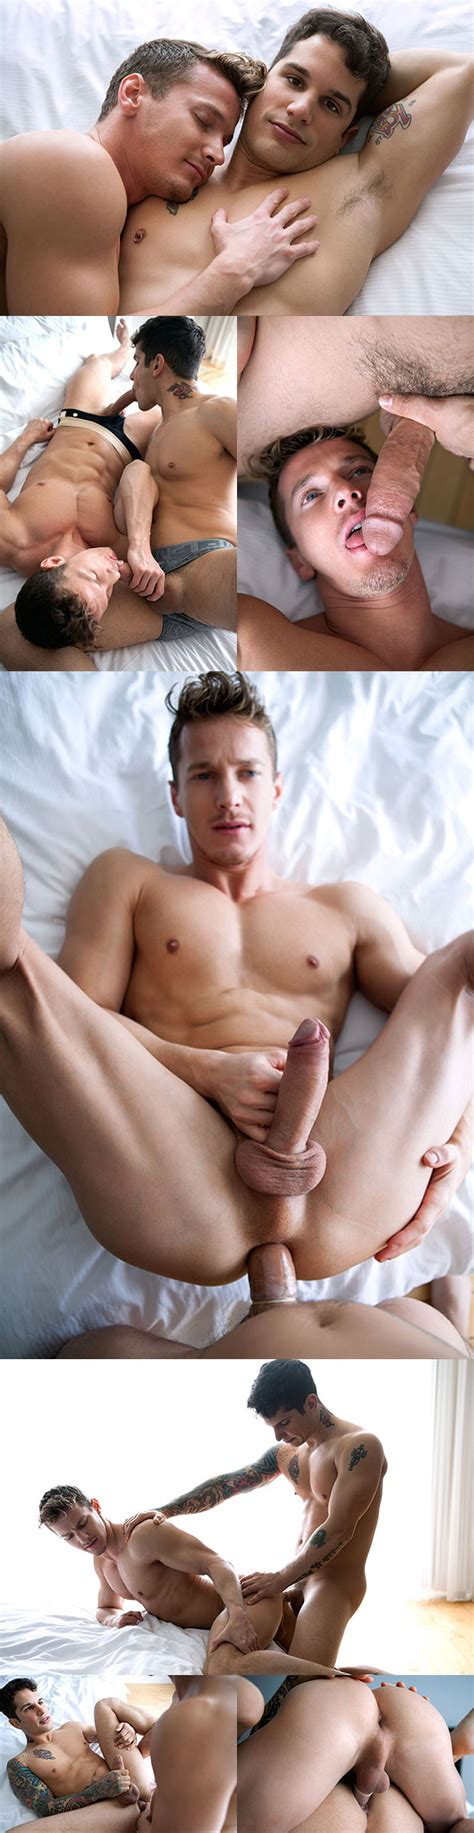 Adam Champ Carlo Masi Gay Porn Free Videos interview with darius ferdynand gay porn blog gaydemon